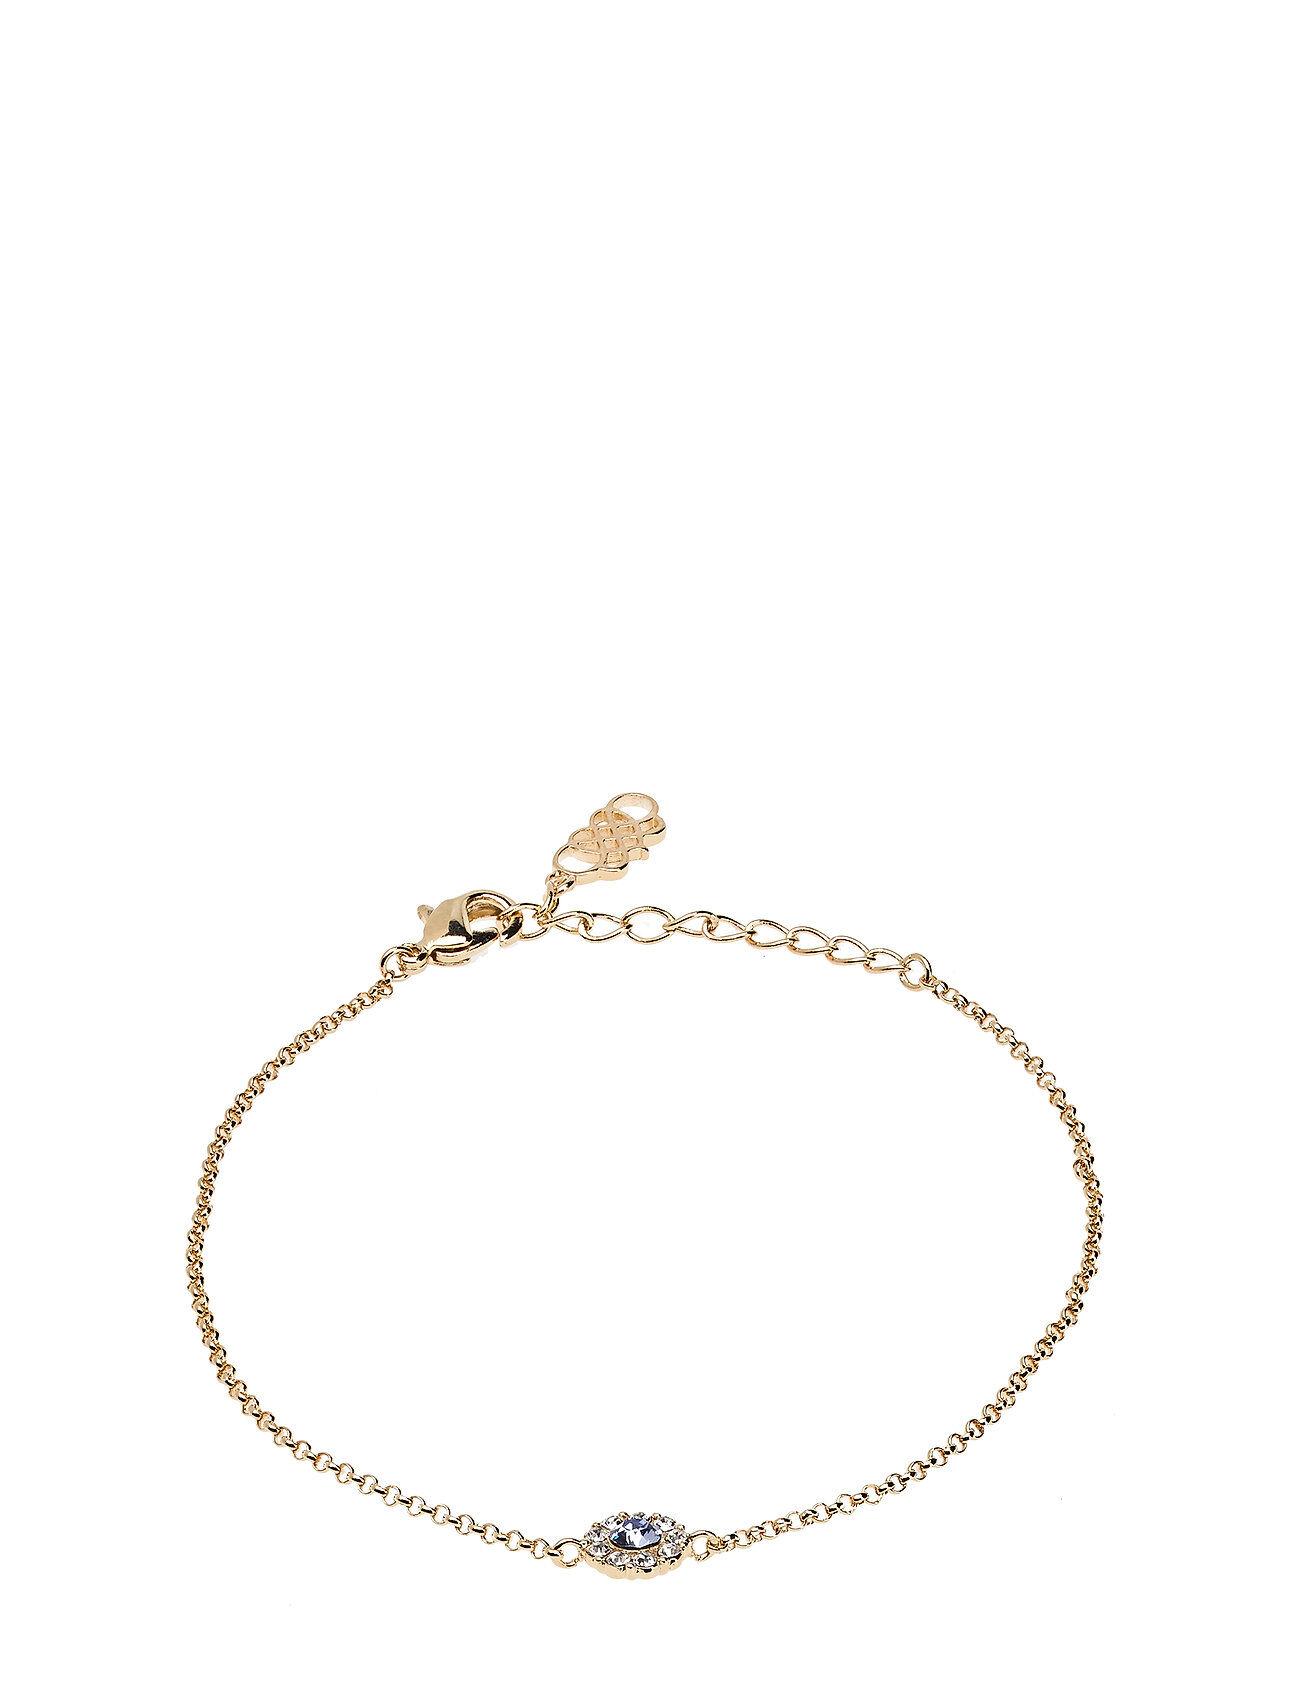 LILY AND ROSE Petite Miss Sofia Bracelet - Light Sapphire Accessories Jewellery Bracelets Chain Bracelets Sininen LILY AND ROSE